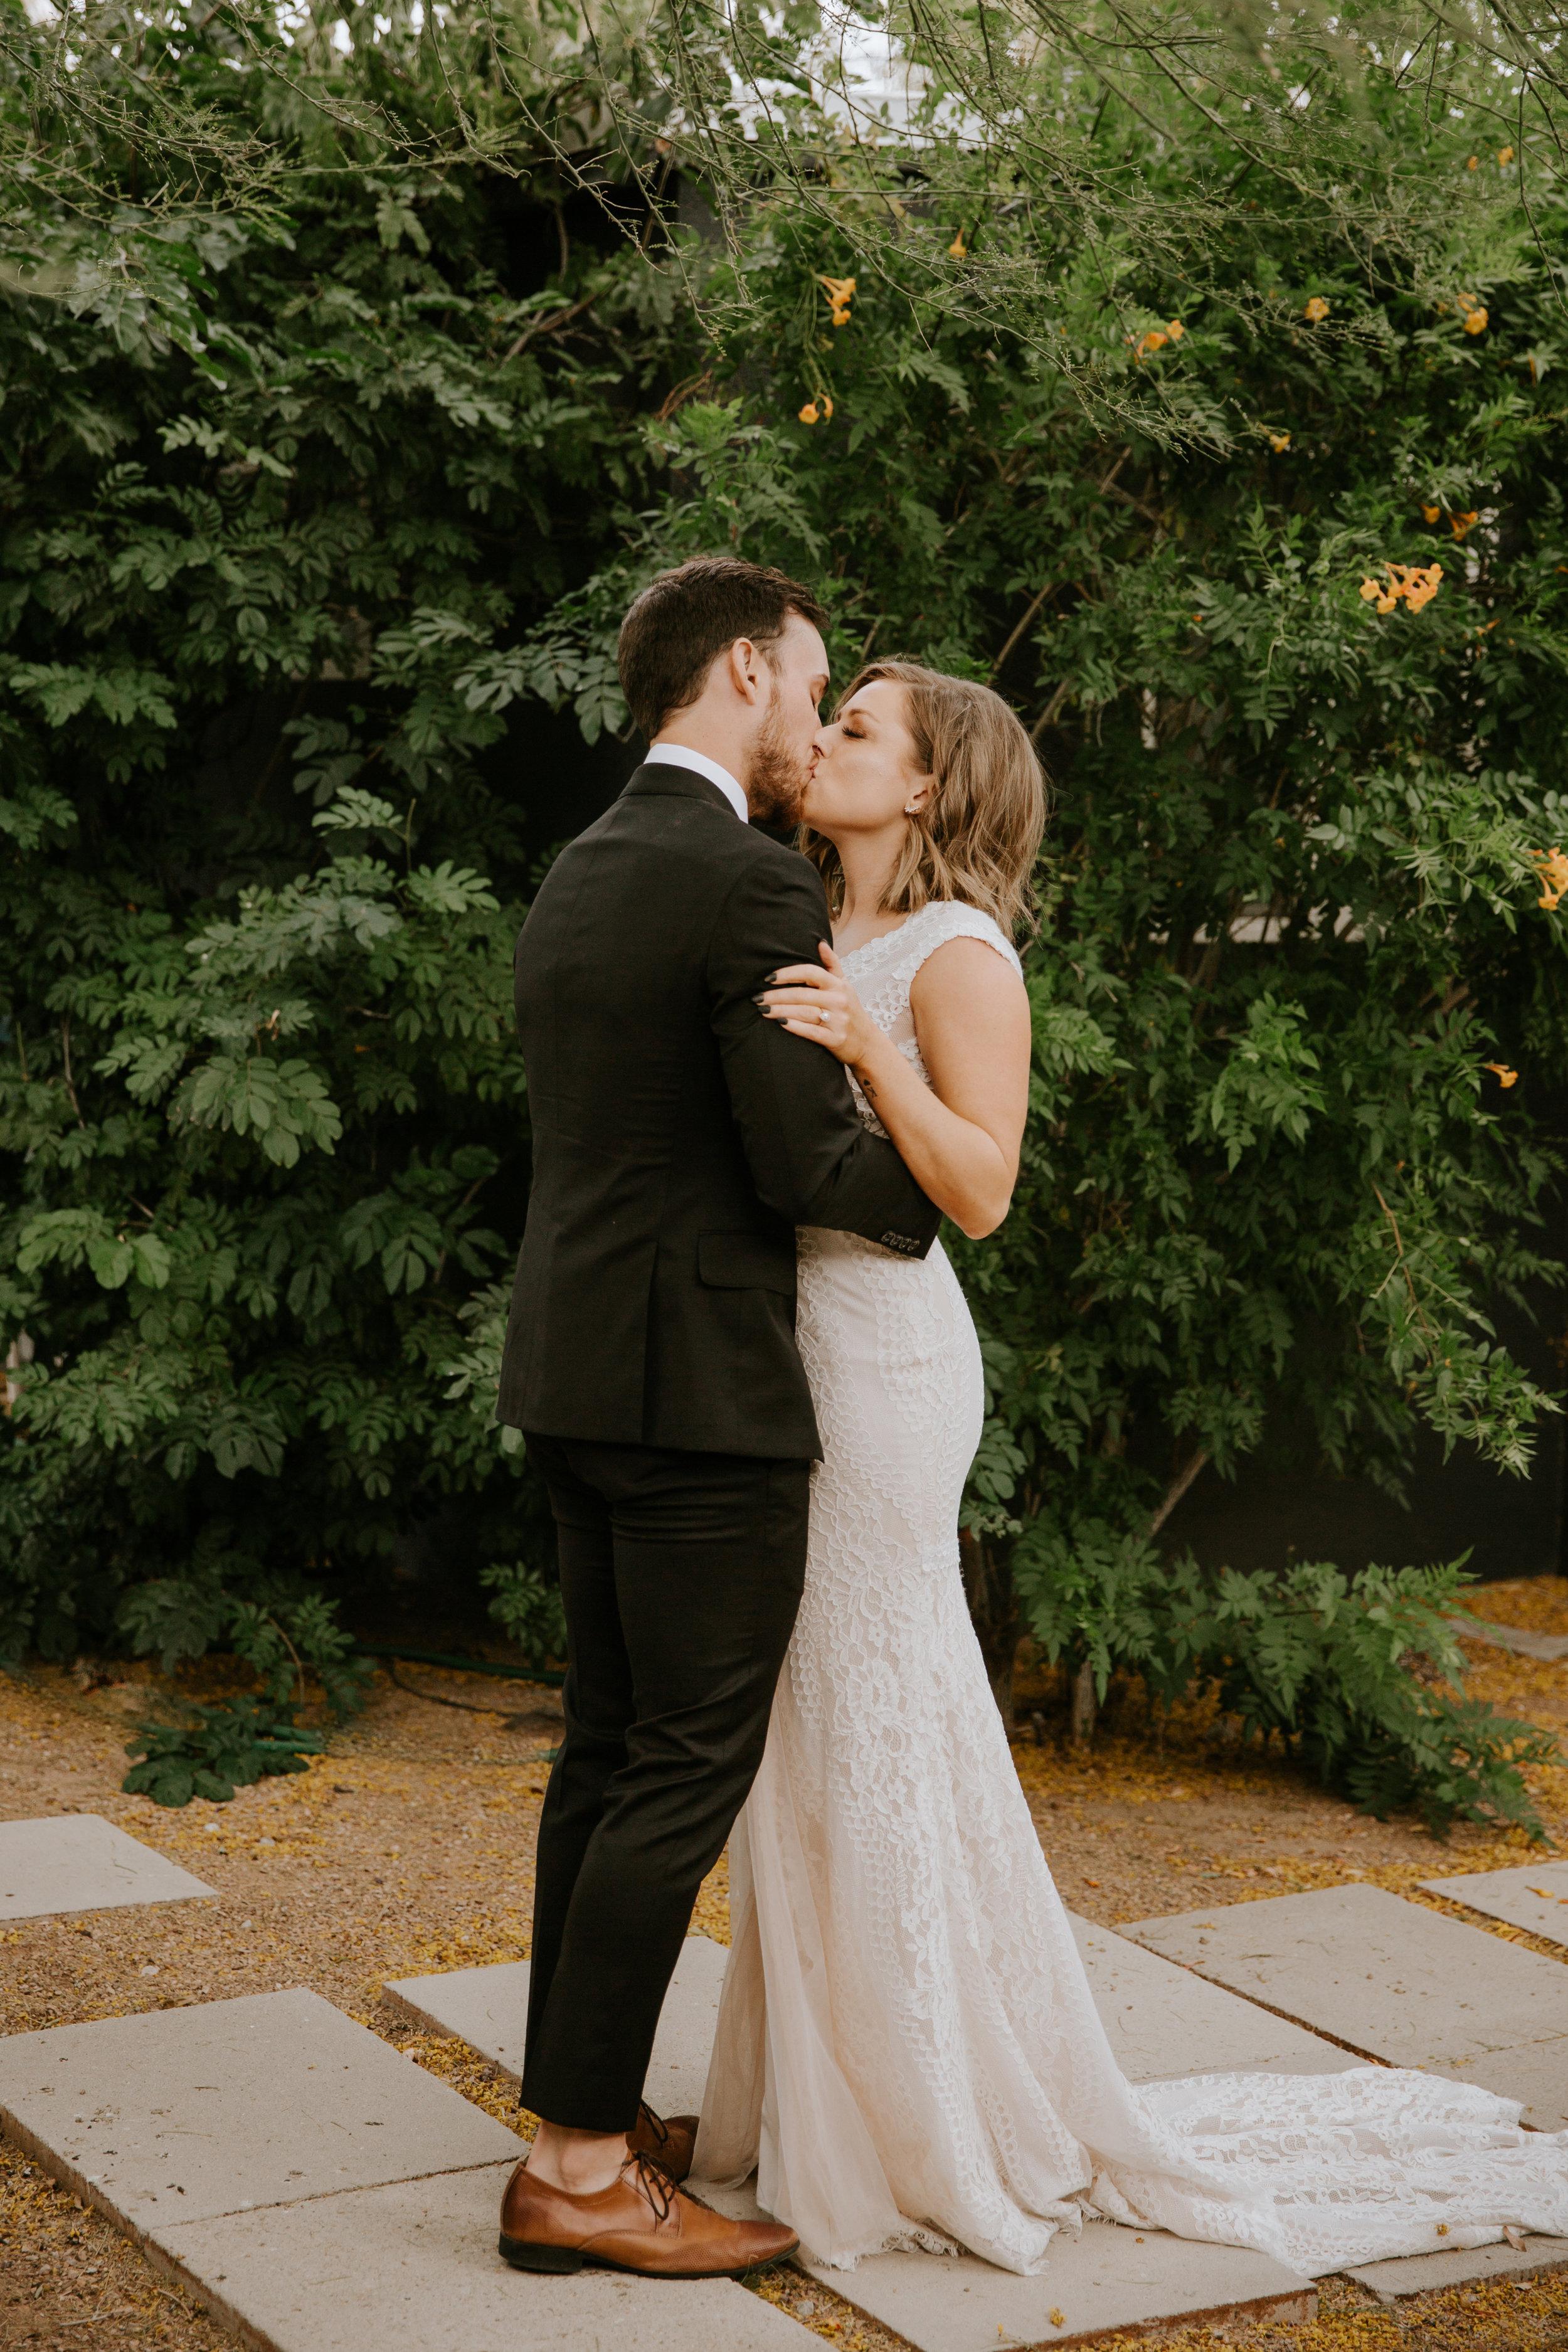 2019-05-26_Callie-Evan_Wedding_Joshua Tree_Paige Nelson_PREVIEWS HR-21.jpg